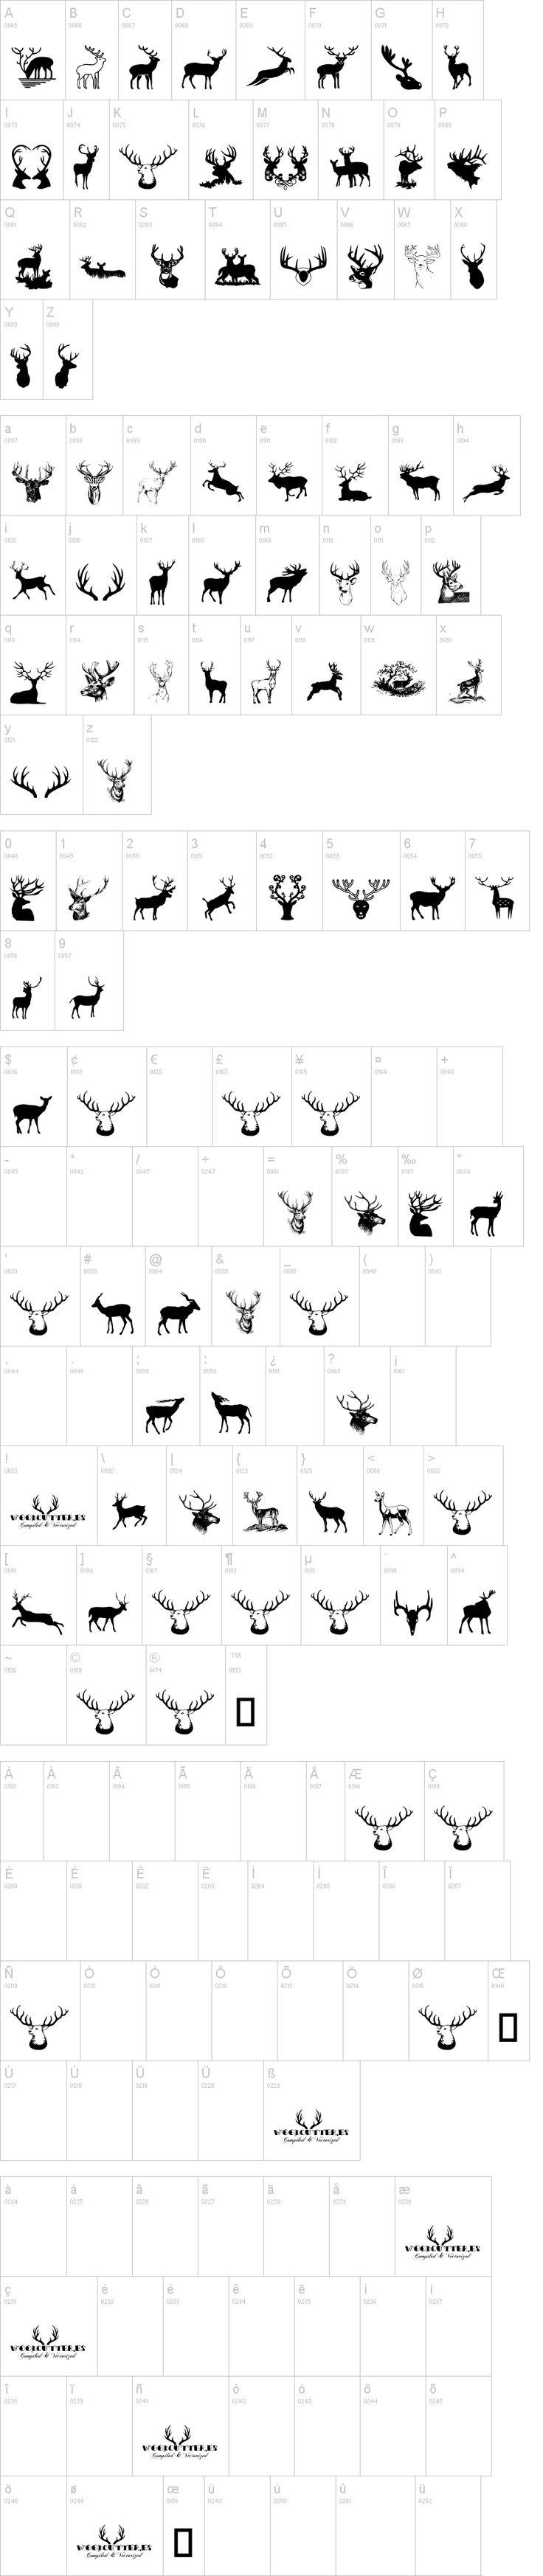 Deers dafont.com